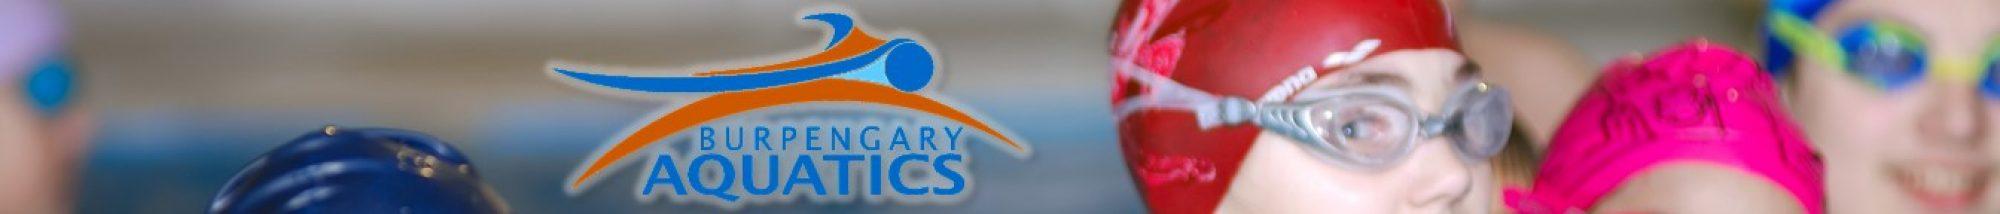 Burpengary Aquatics